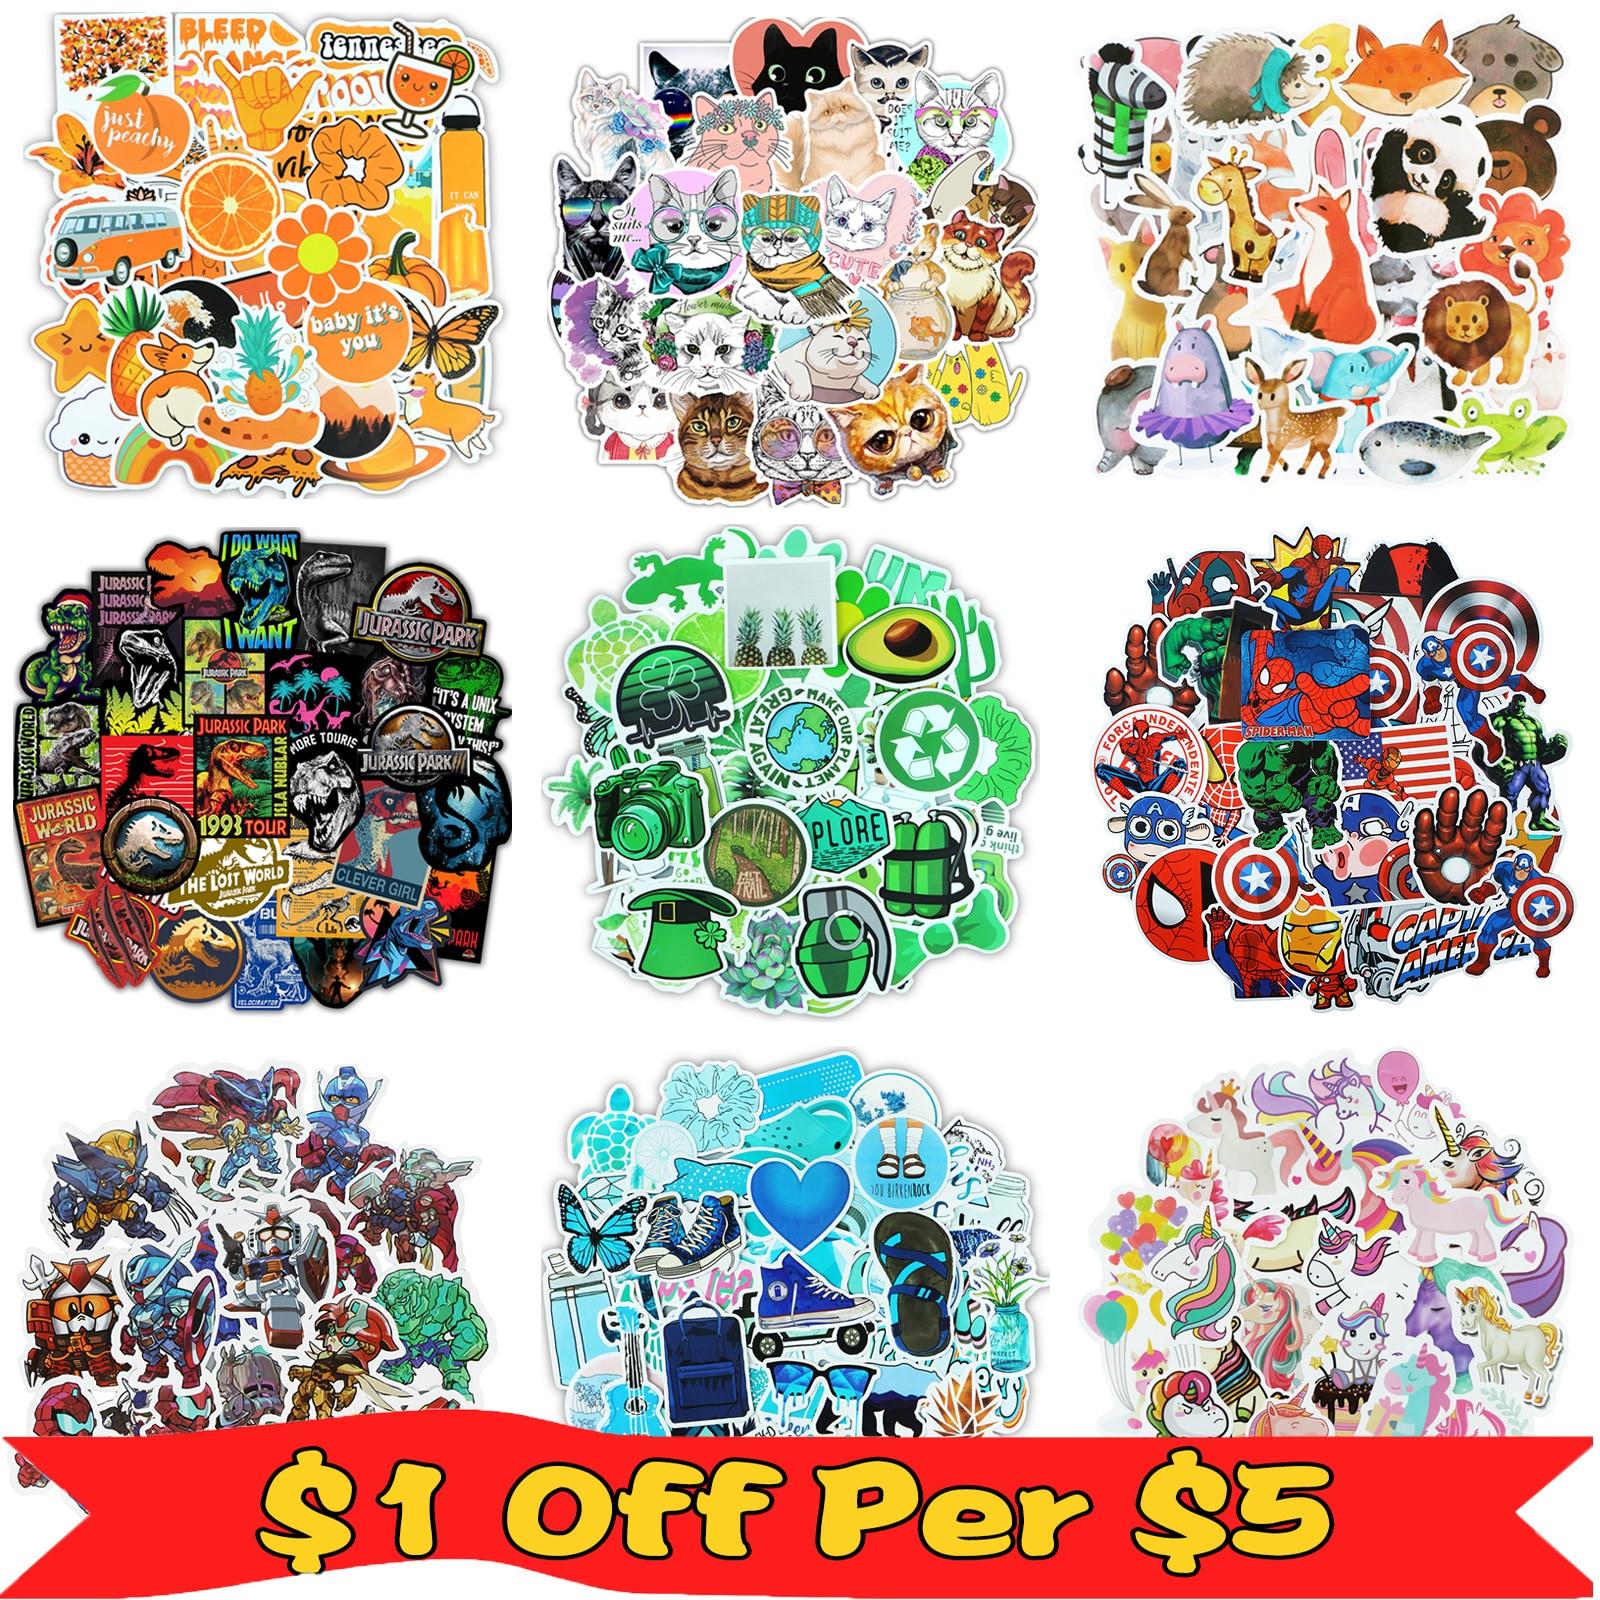 52/50 Pcs/Lot VSCO Stickers Mixed Cartoon Animal Super Hero Sticker For Water Bottle Luggage Notebook Skateboard Kids Toy